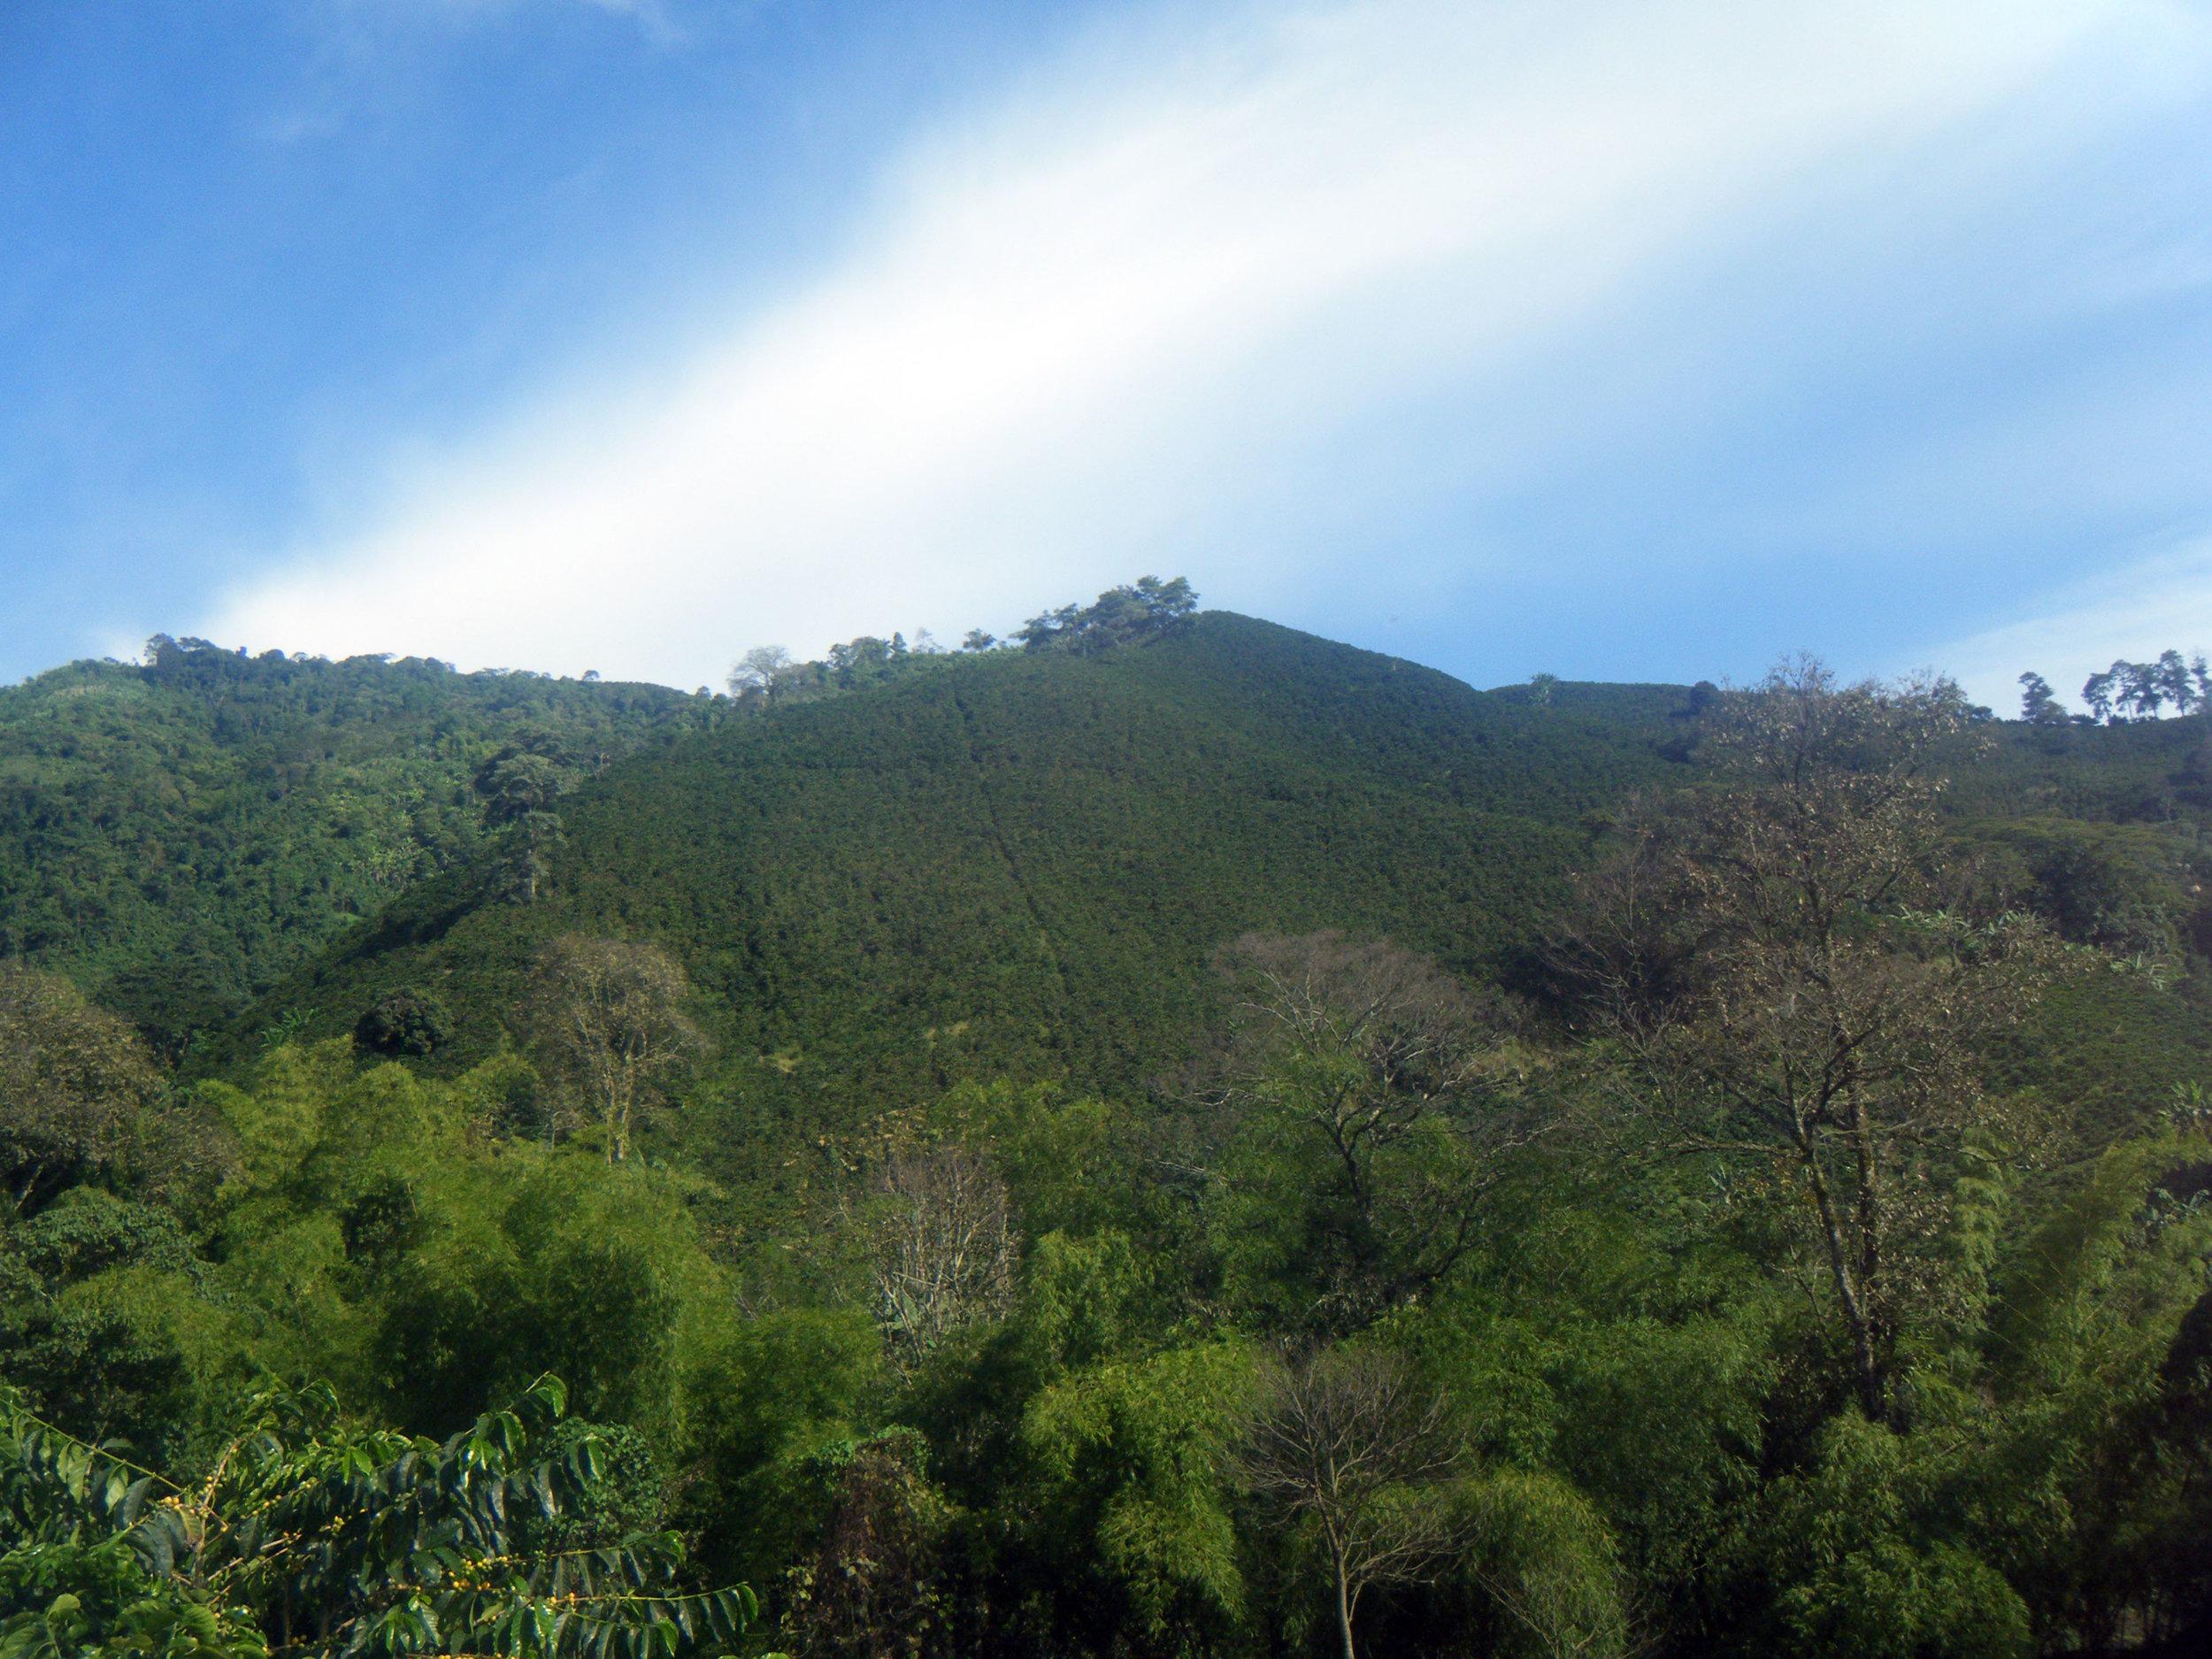 coffee farm 10-21-12.jpg